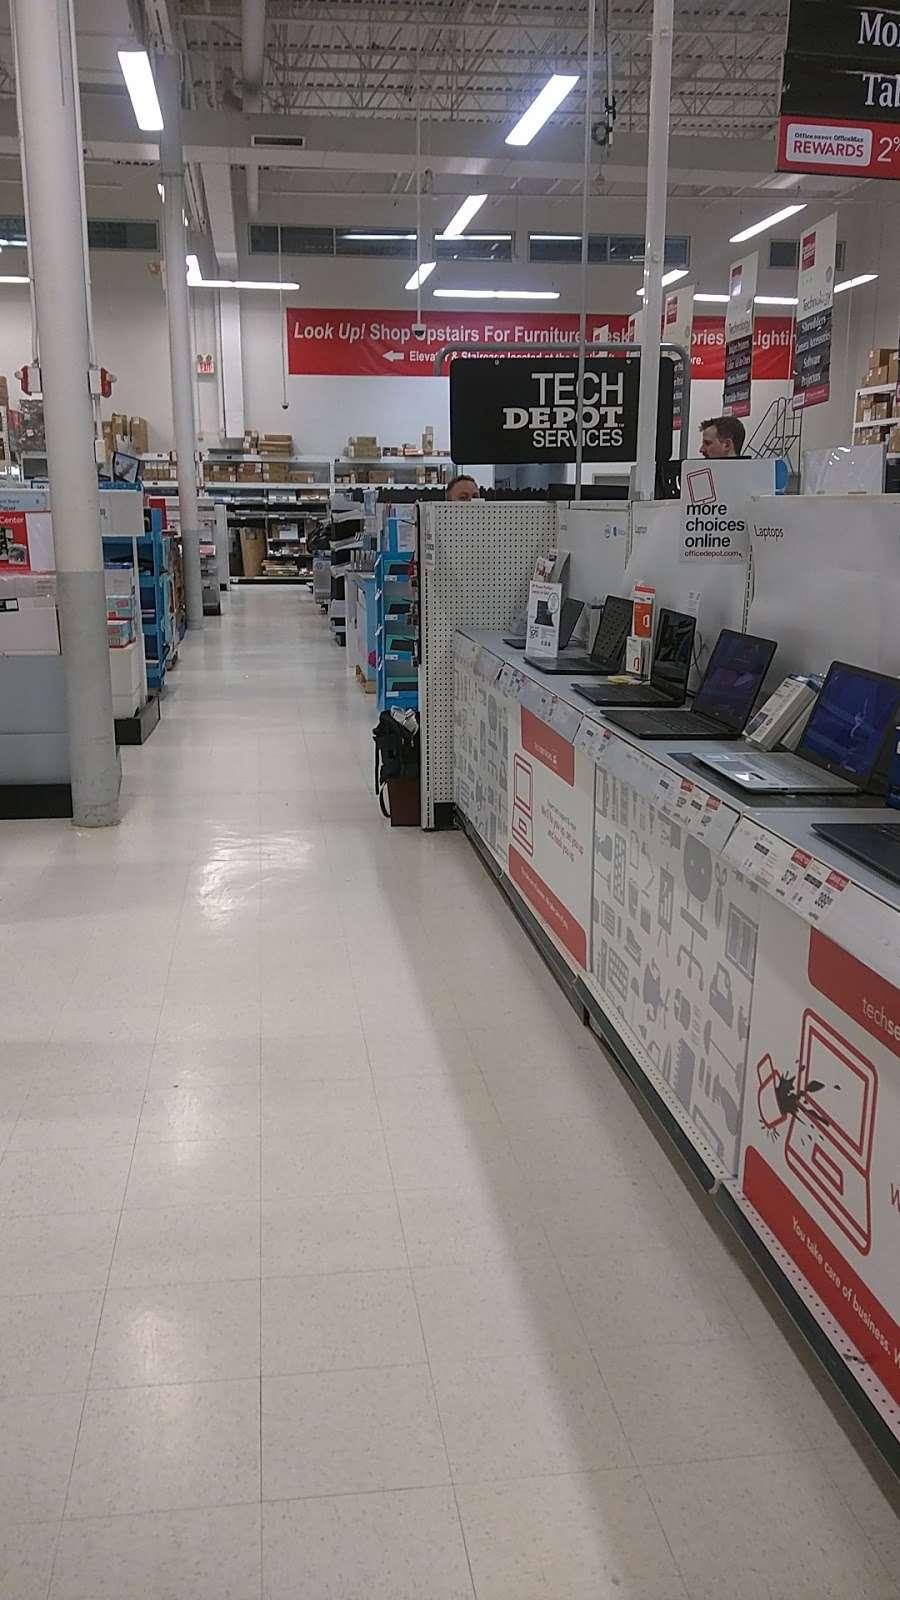 Office Depot - furniture store  | Photo 8 of 10 | Address: 12275 Price Club Plaza #C, Fairfax, VA 22030, USA | Phone: (703) 830-7773